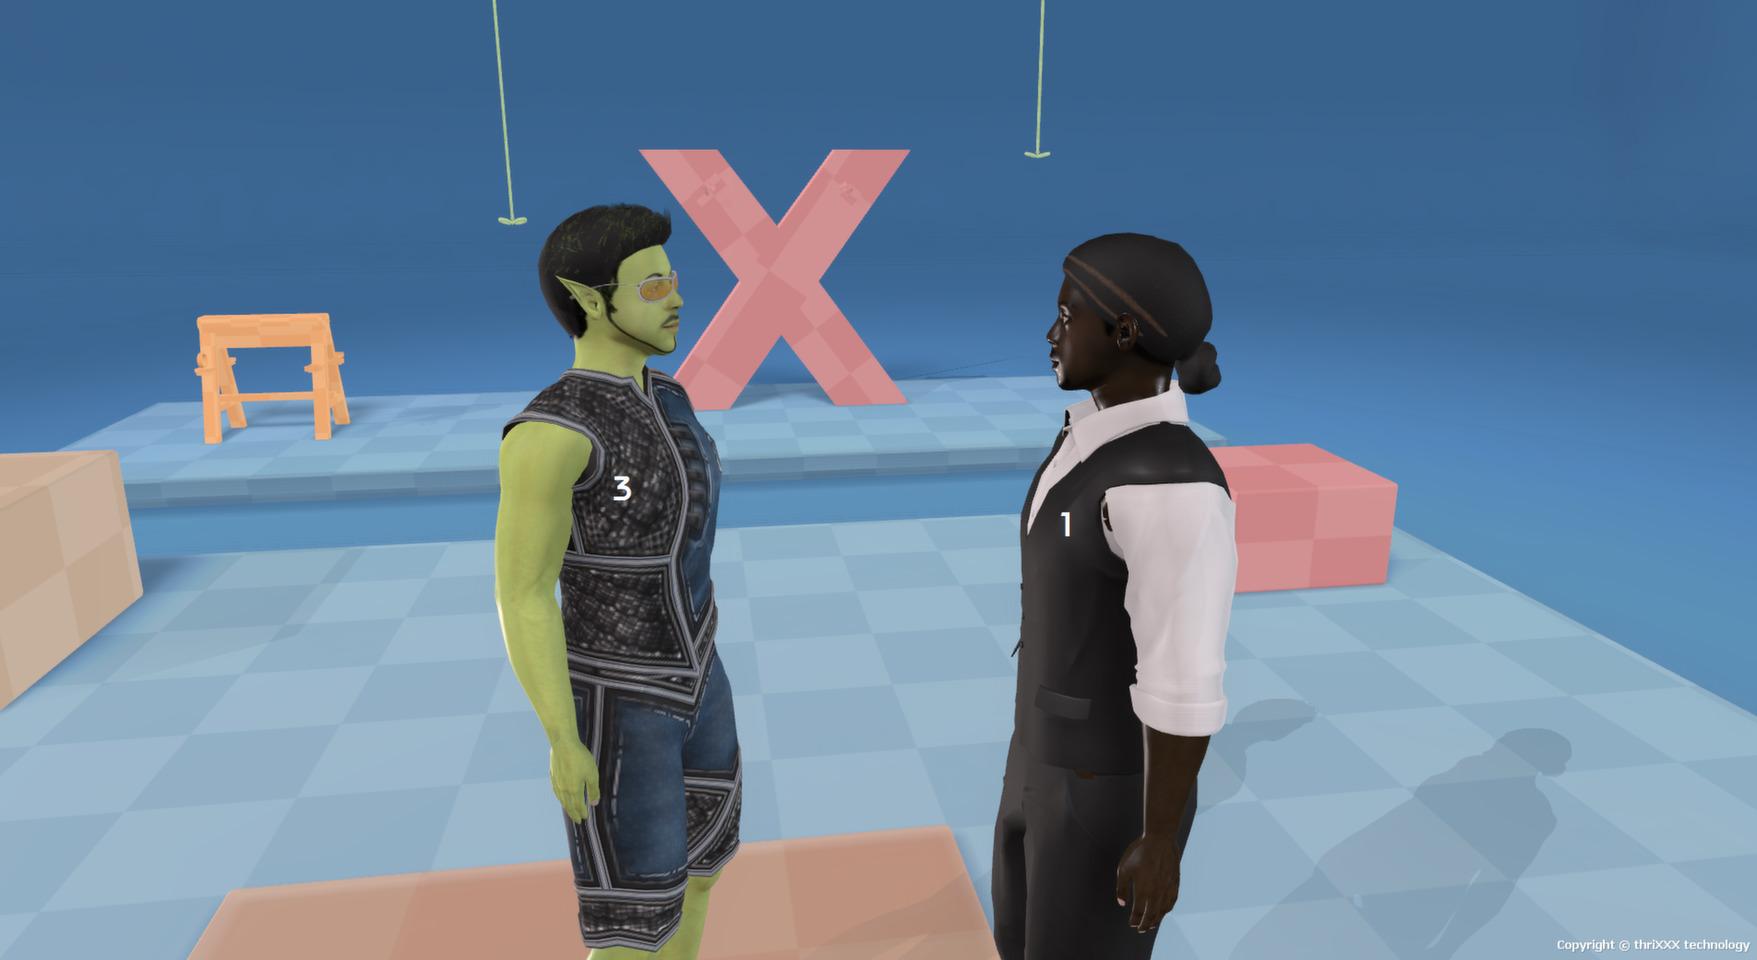   thriXXX - Interactive Hardcore 3D Sex Games